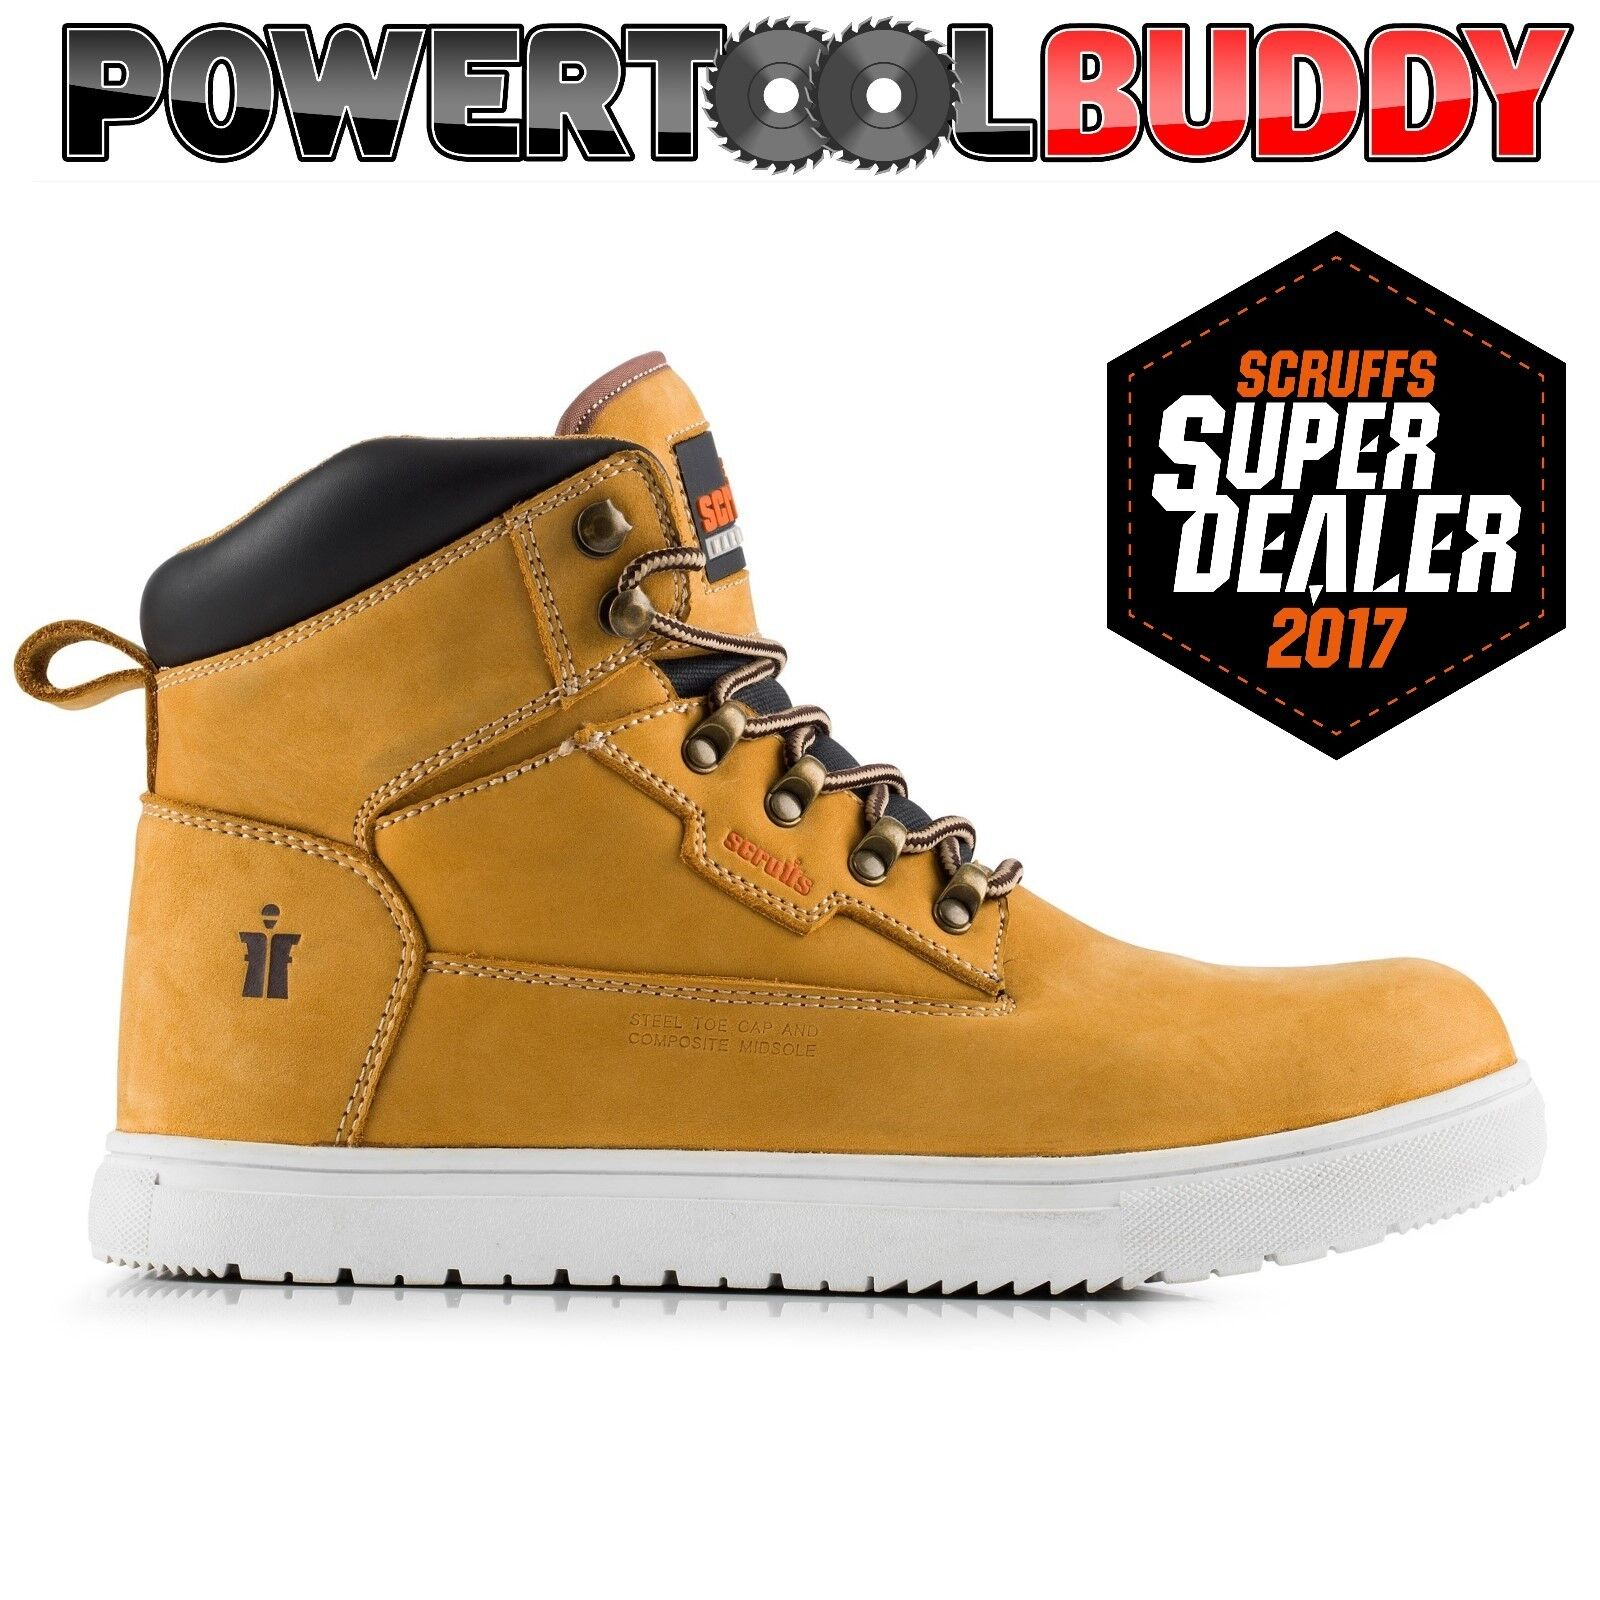 SCRUFFS TWISTER SPORT  Uomo Tan Work Site Safety Stiefel STEEL TOE CAP New Style